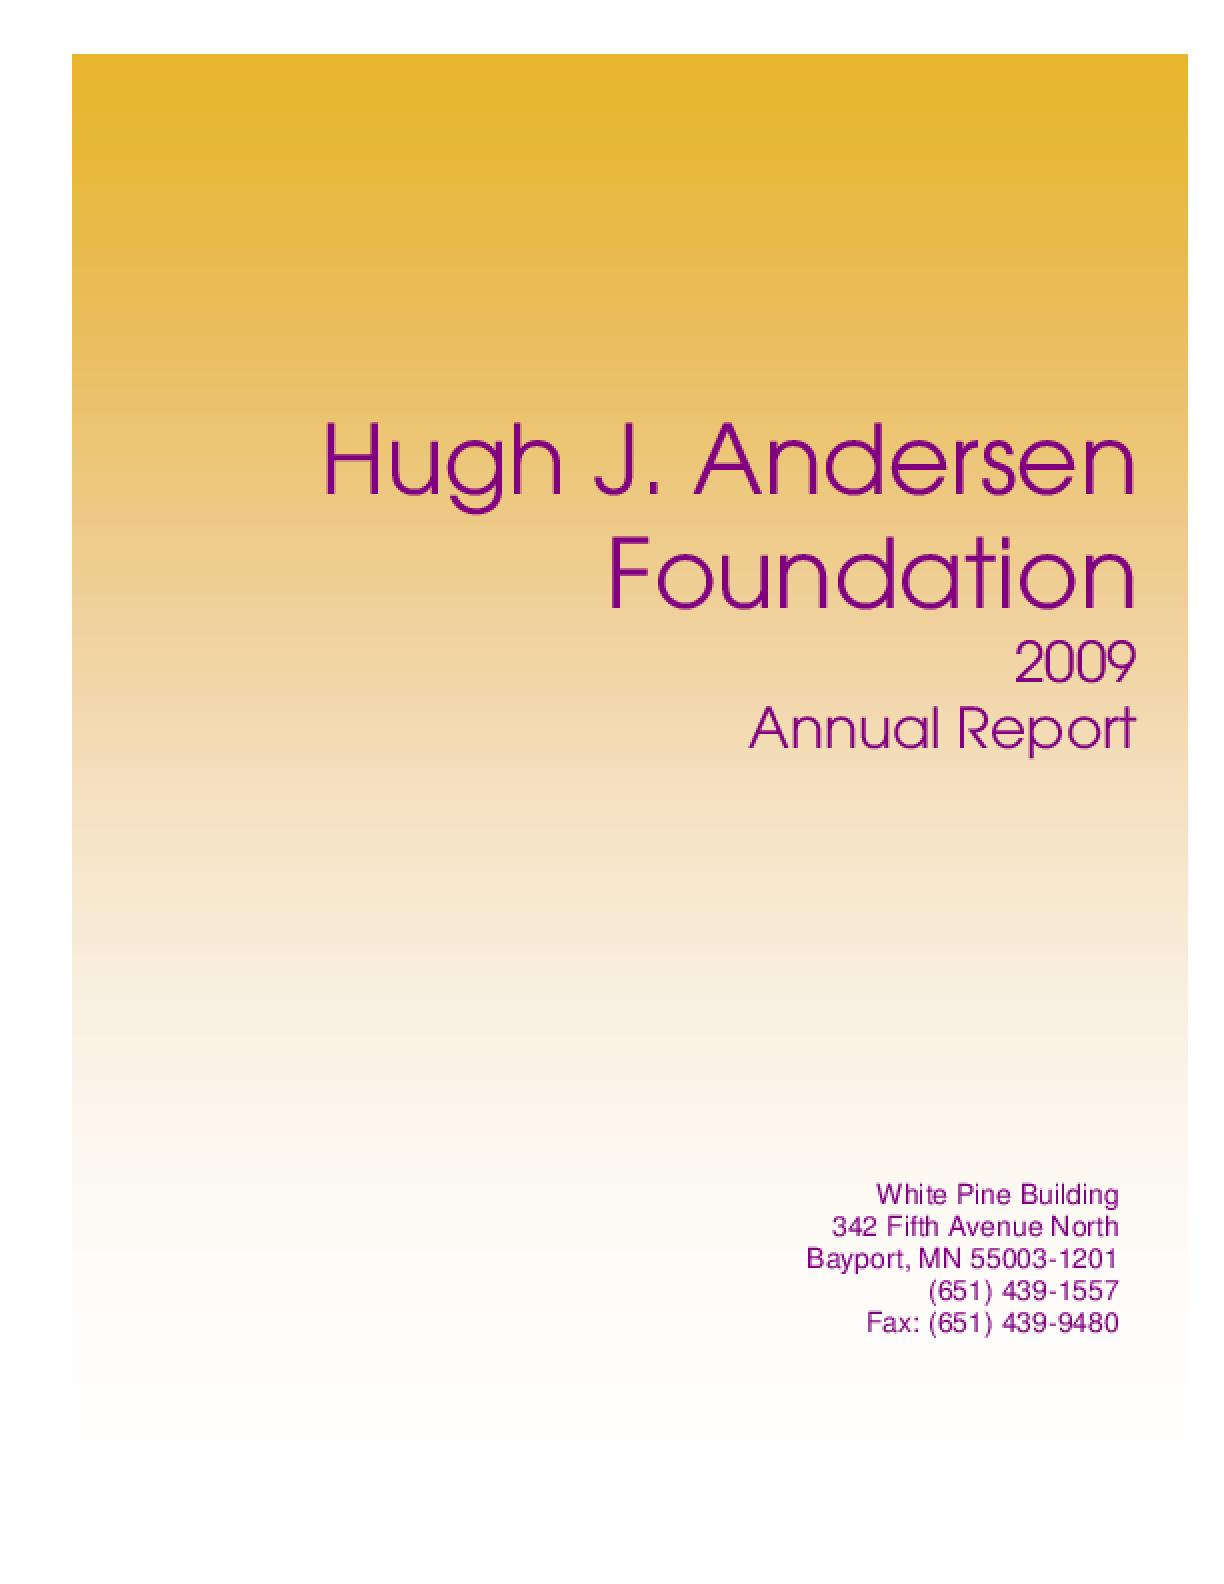 Hugh J. Andersen Foundation - 2009 Annual Report